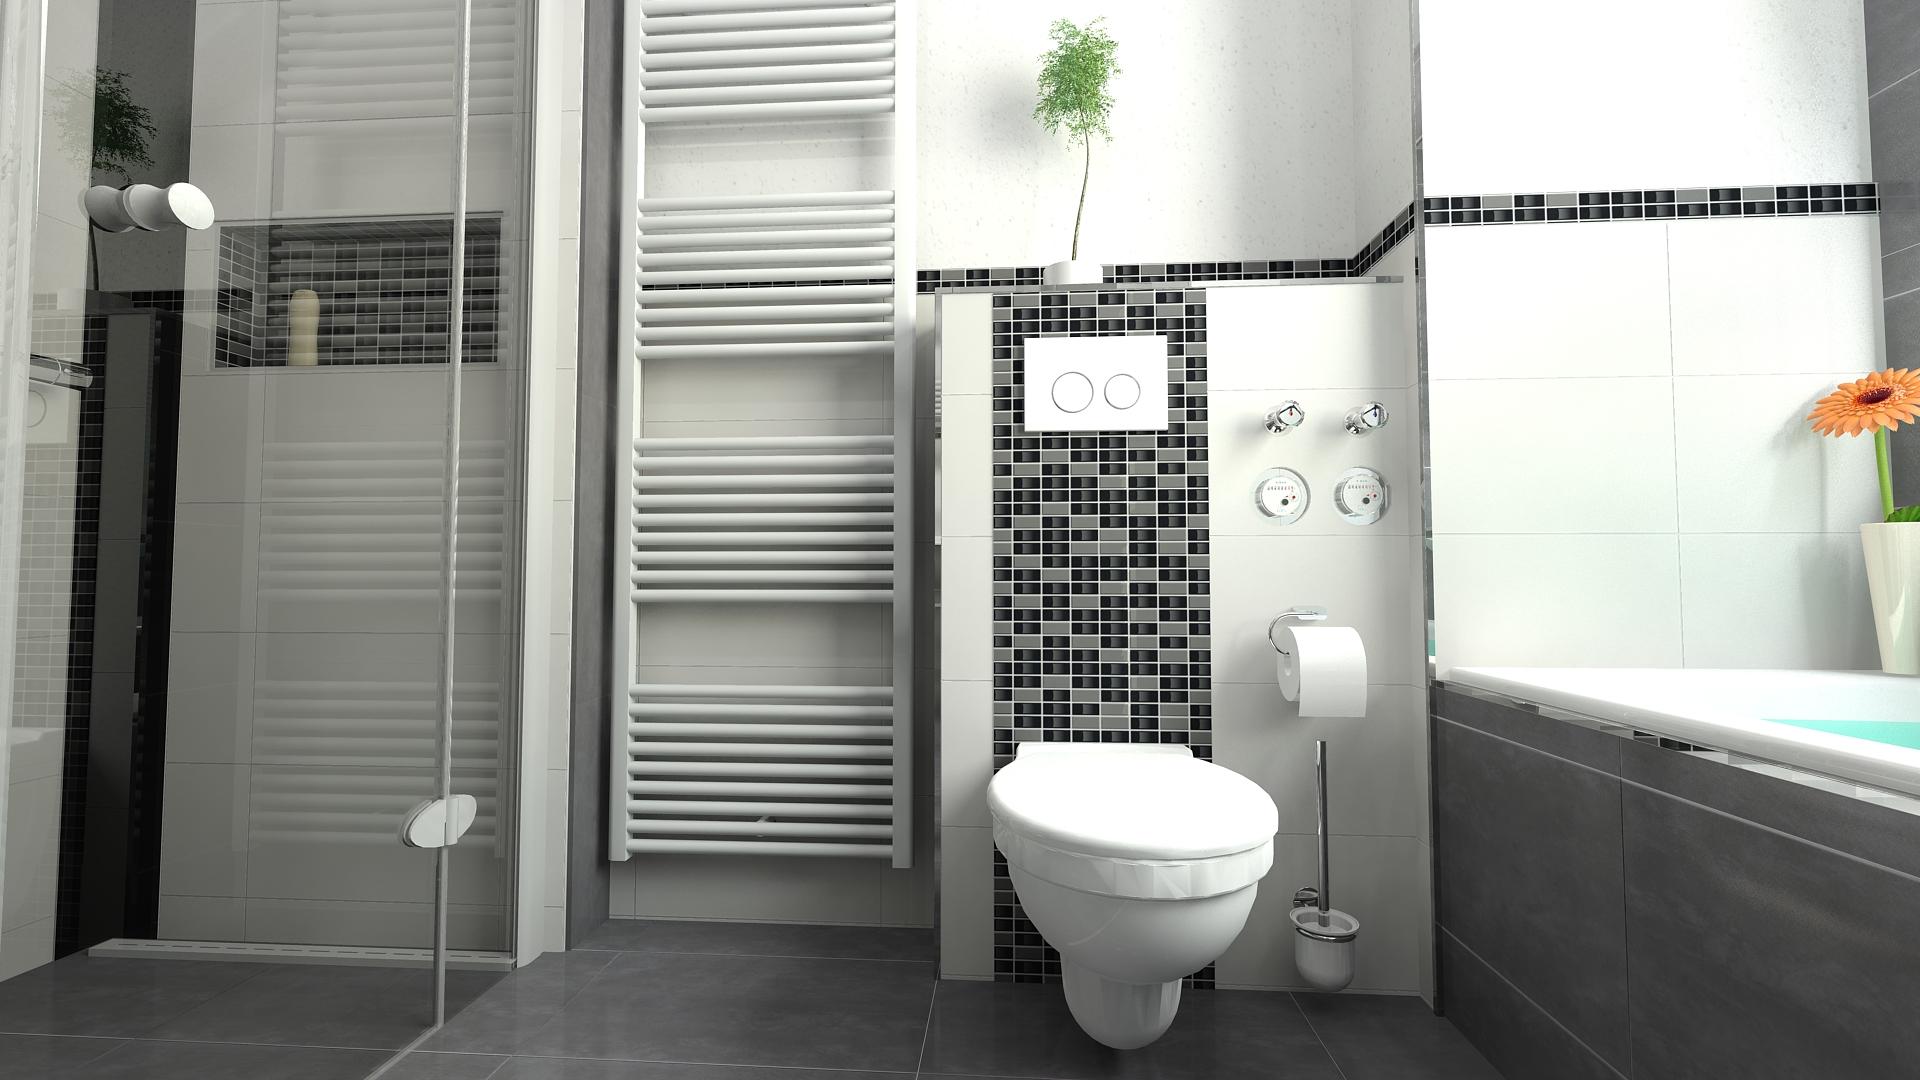 Kunden-Bad02 Bathroom By Gerd Nolte Inh.R.Schumann(Gerd Nolte ...